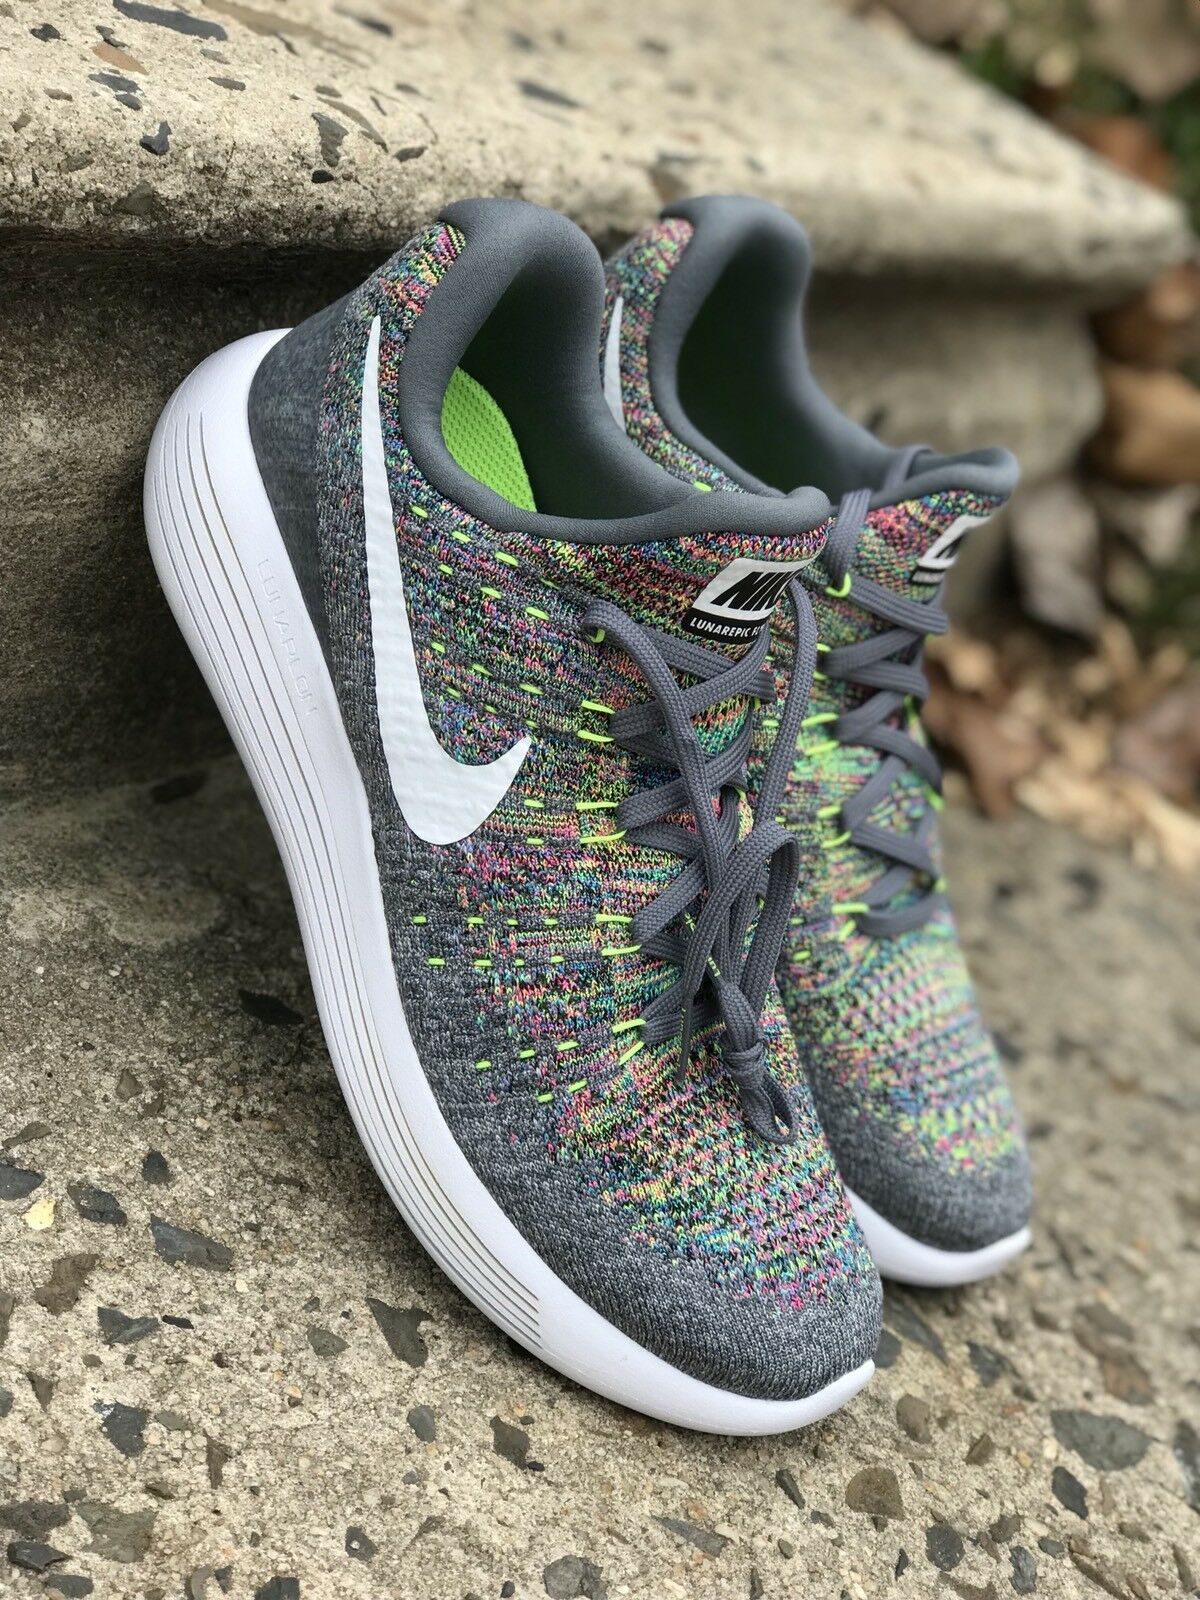 Nike Lunarepic Low Flyknit 2 Mens Running Grey/Multi-Color 863779-003 Sz 8 & 11